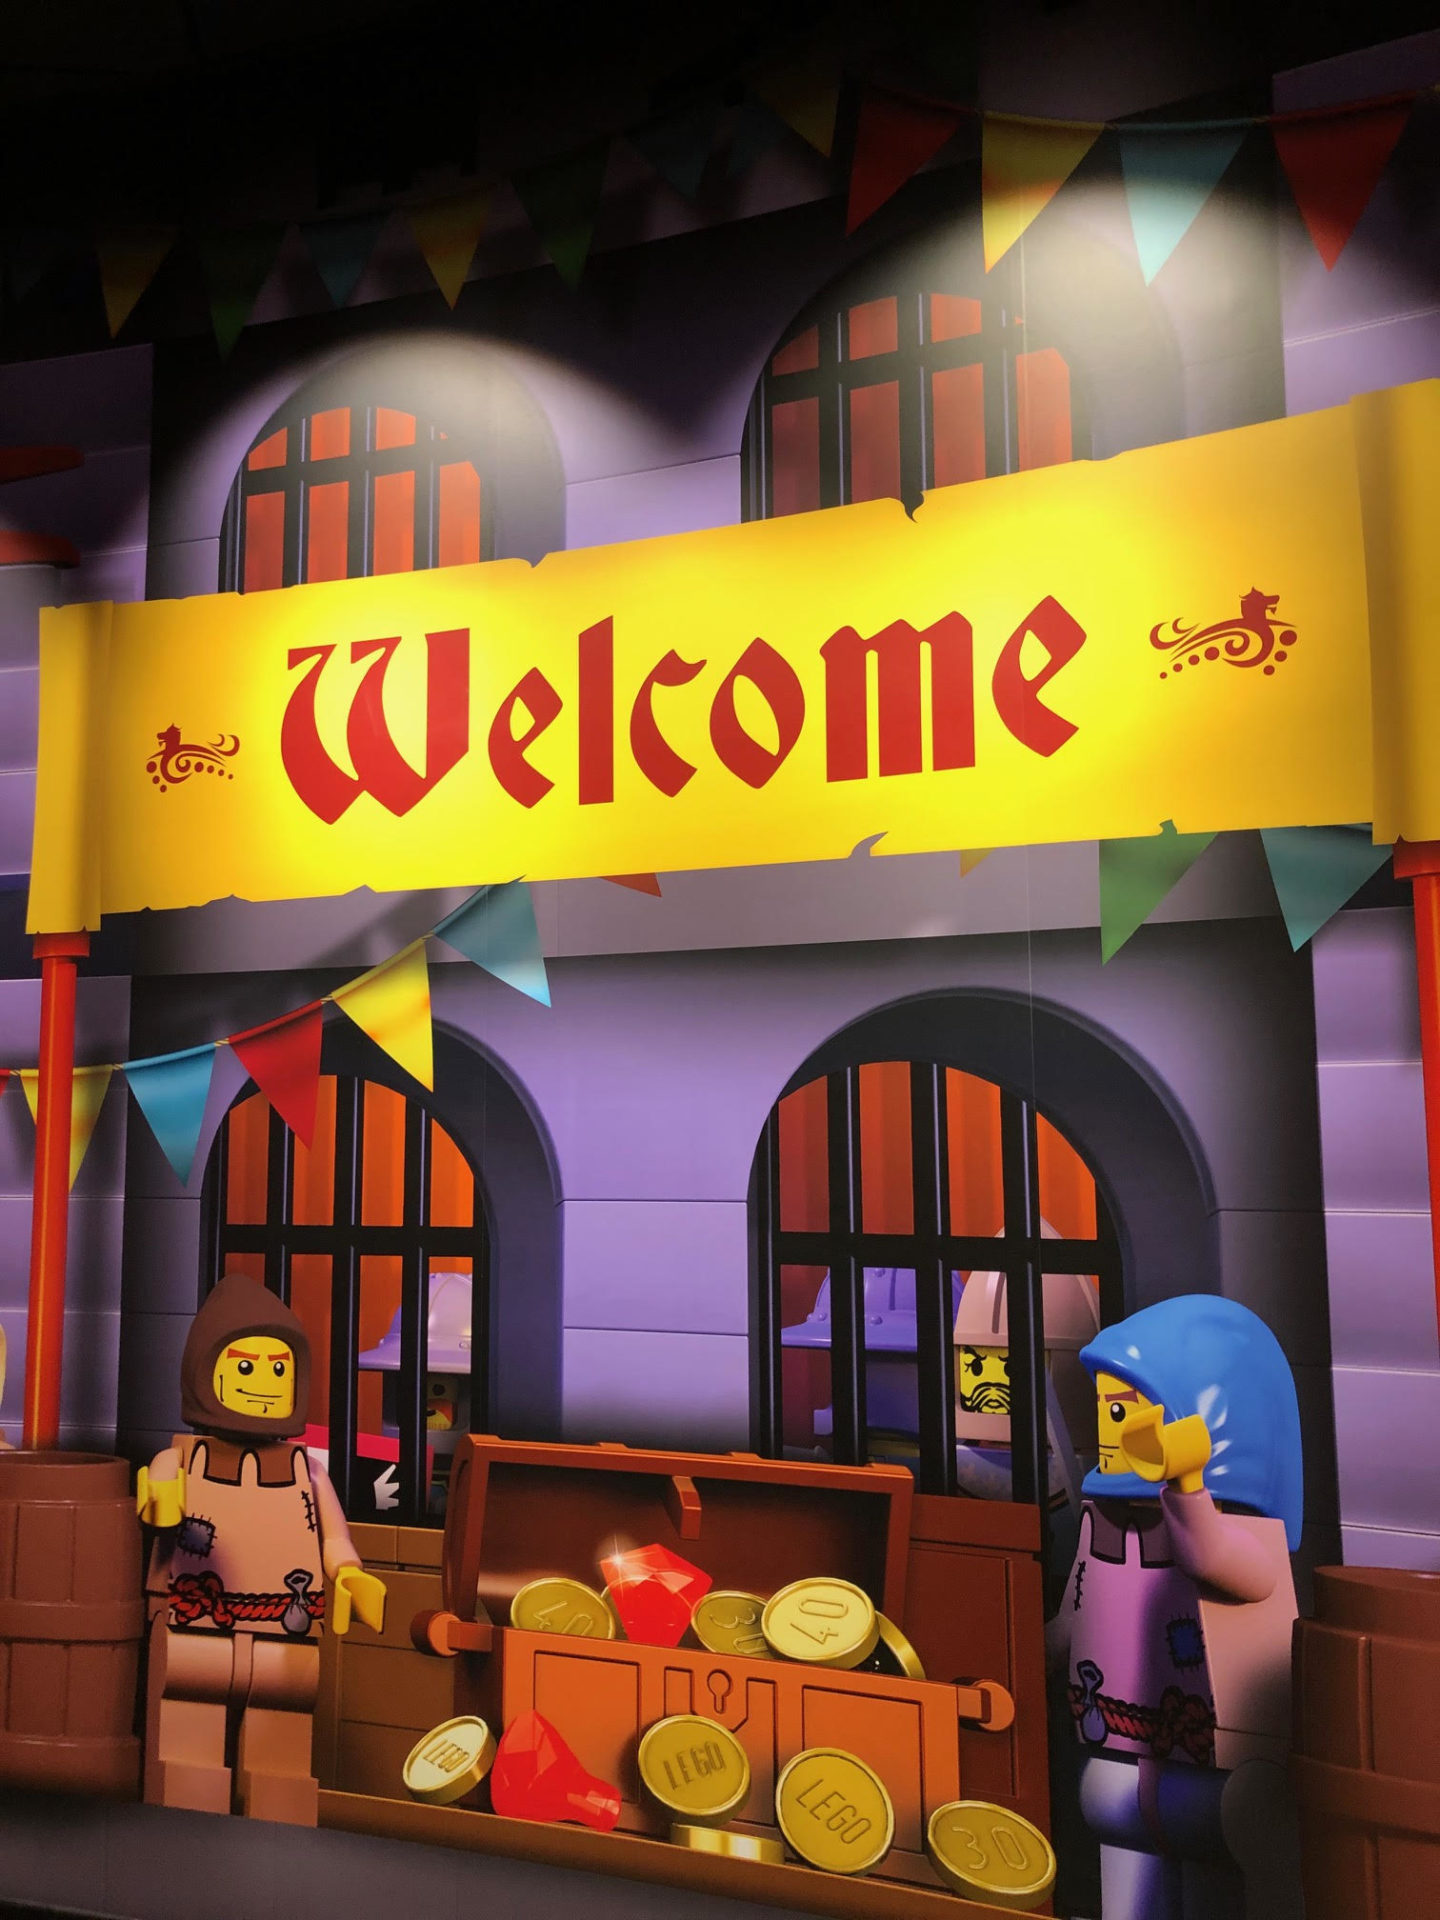 Legoland - Megabus Collaboration